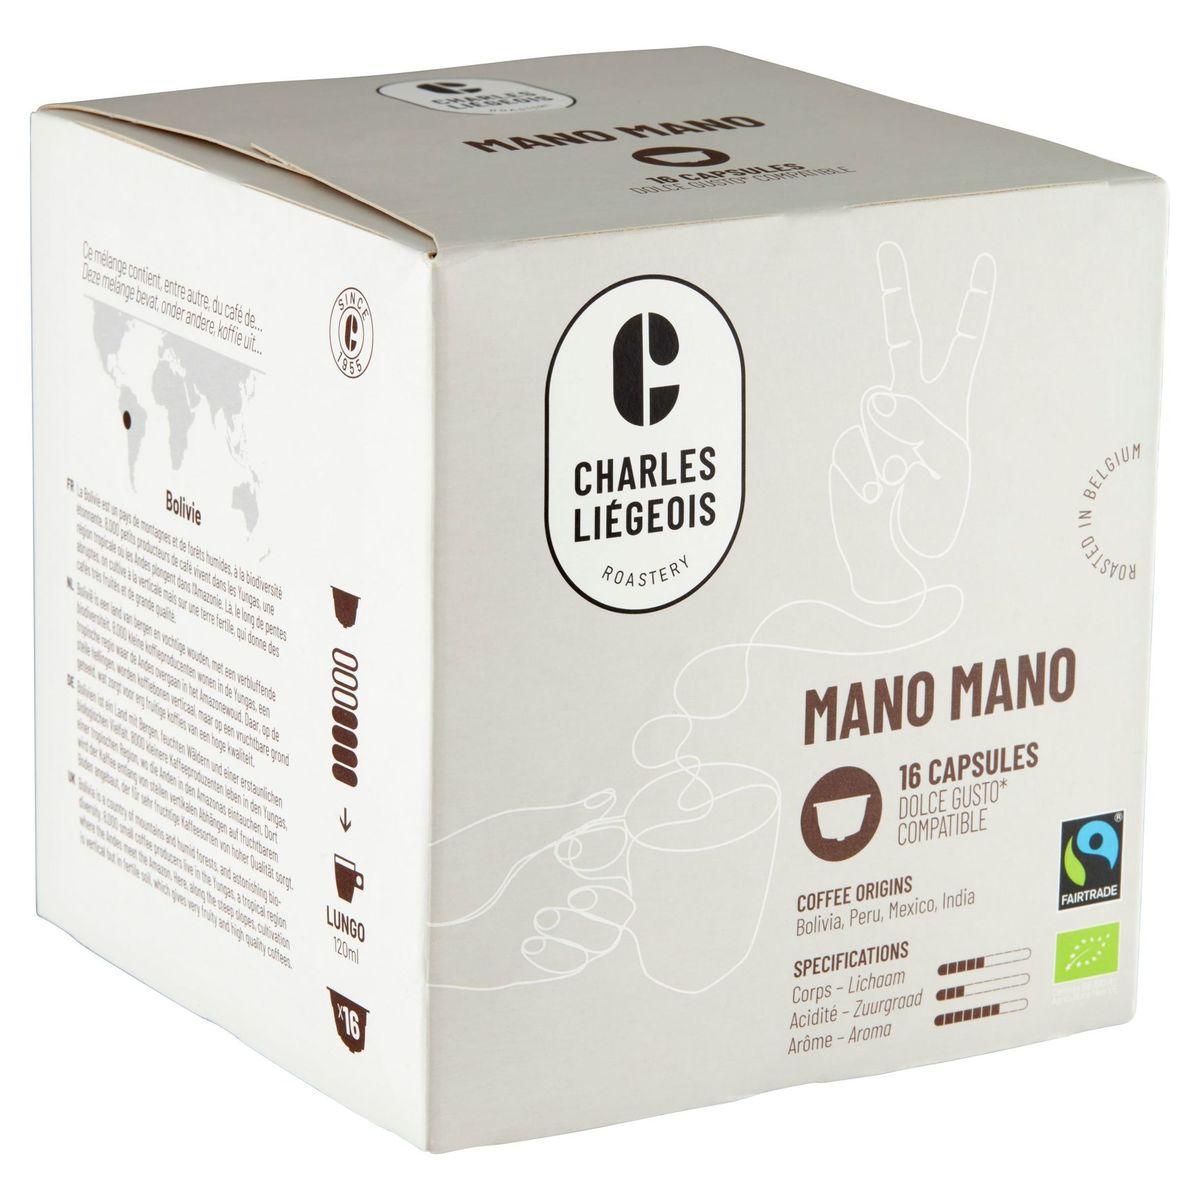 Charles Liégeois Mano Mano 16 Capsules 112 g